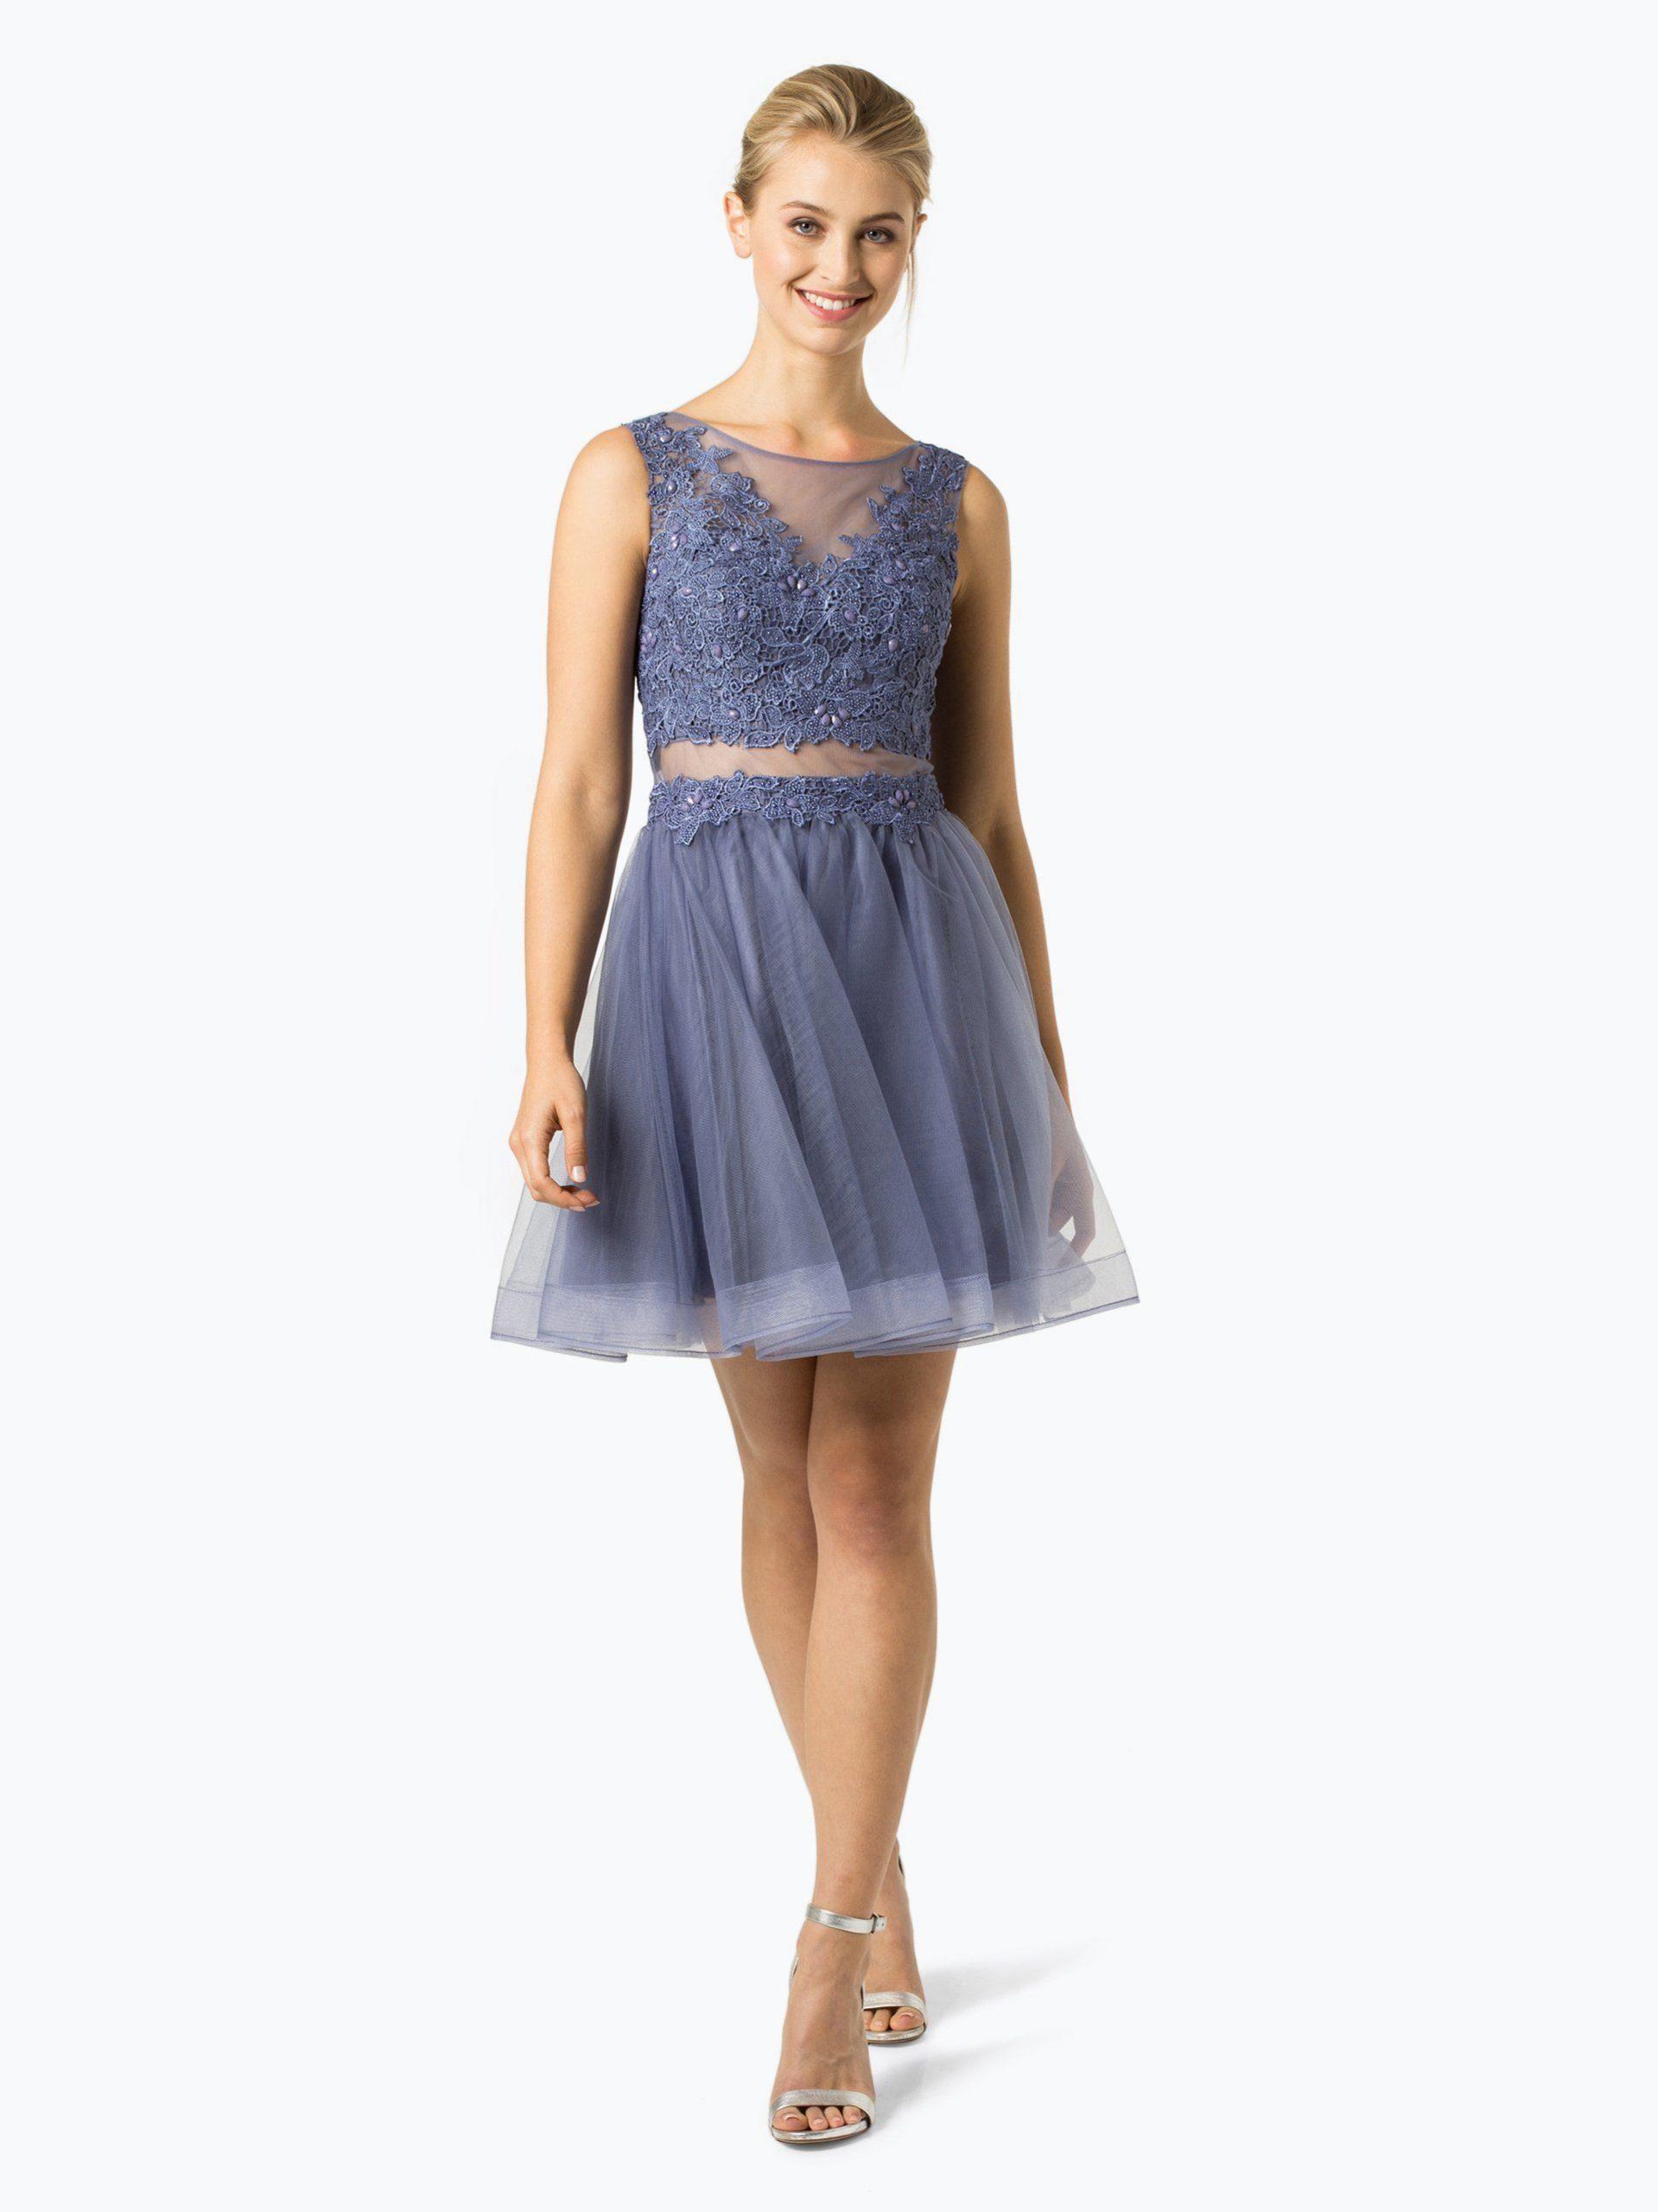 15 Großartig Laona Abendkleid About You Vertrieb Einfach Laona Abendkleid About You Boutique